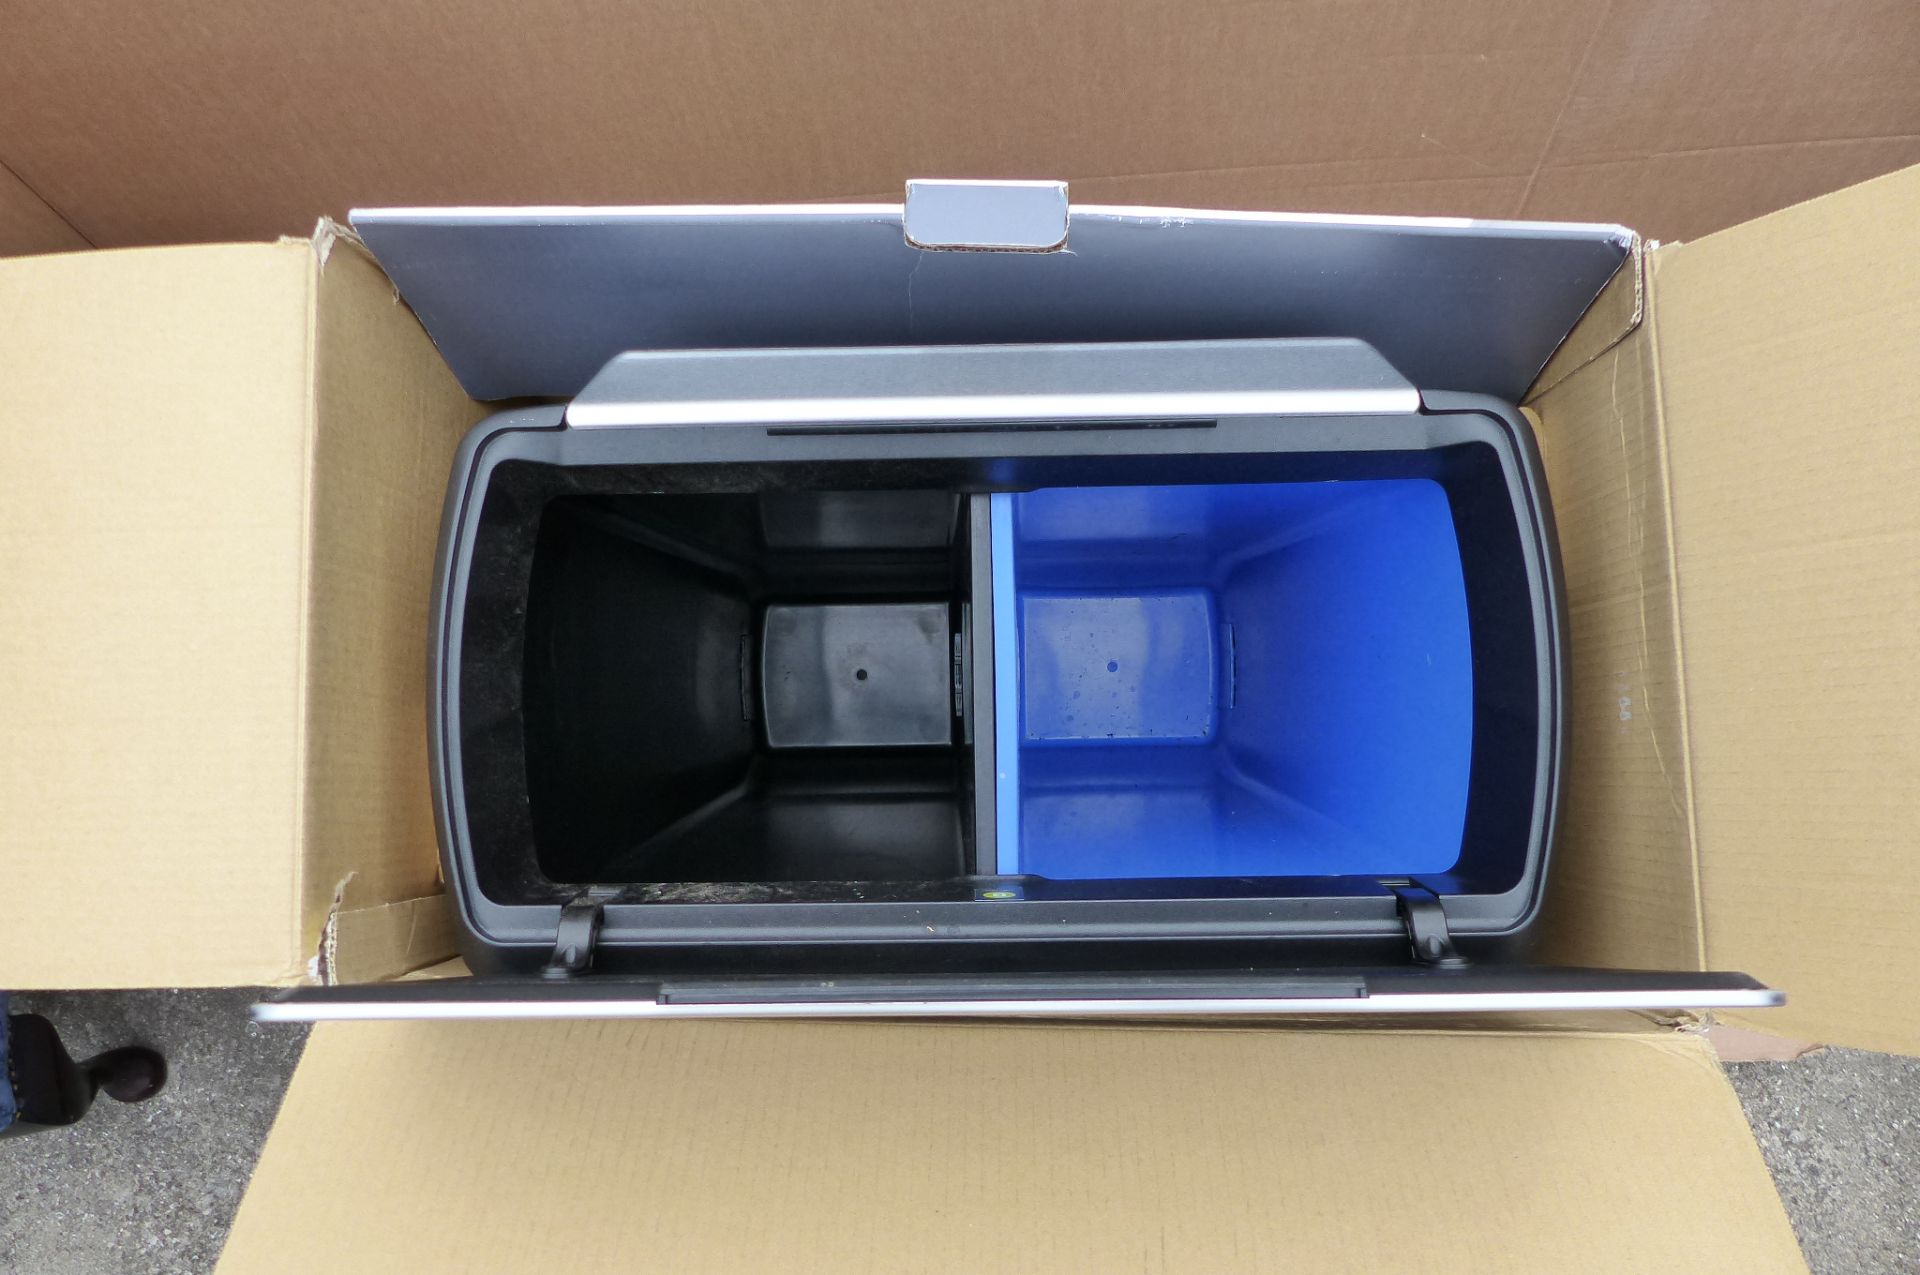 Simplehuman Recycling bin - Image 3 of 3